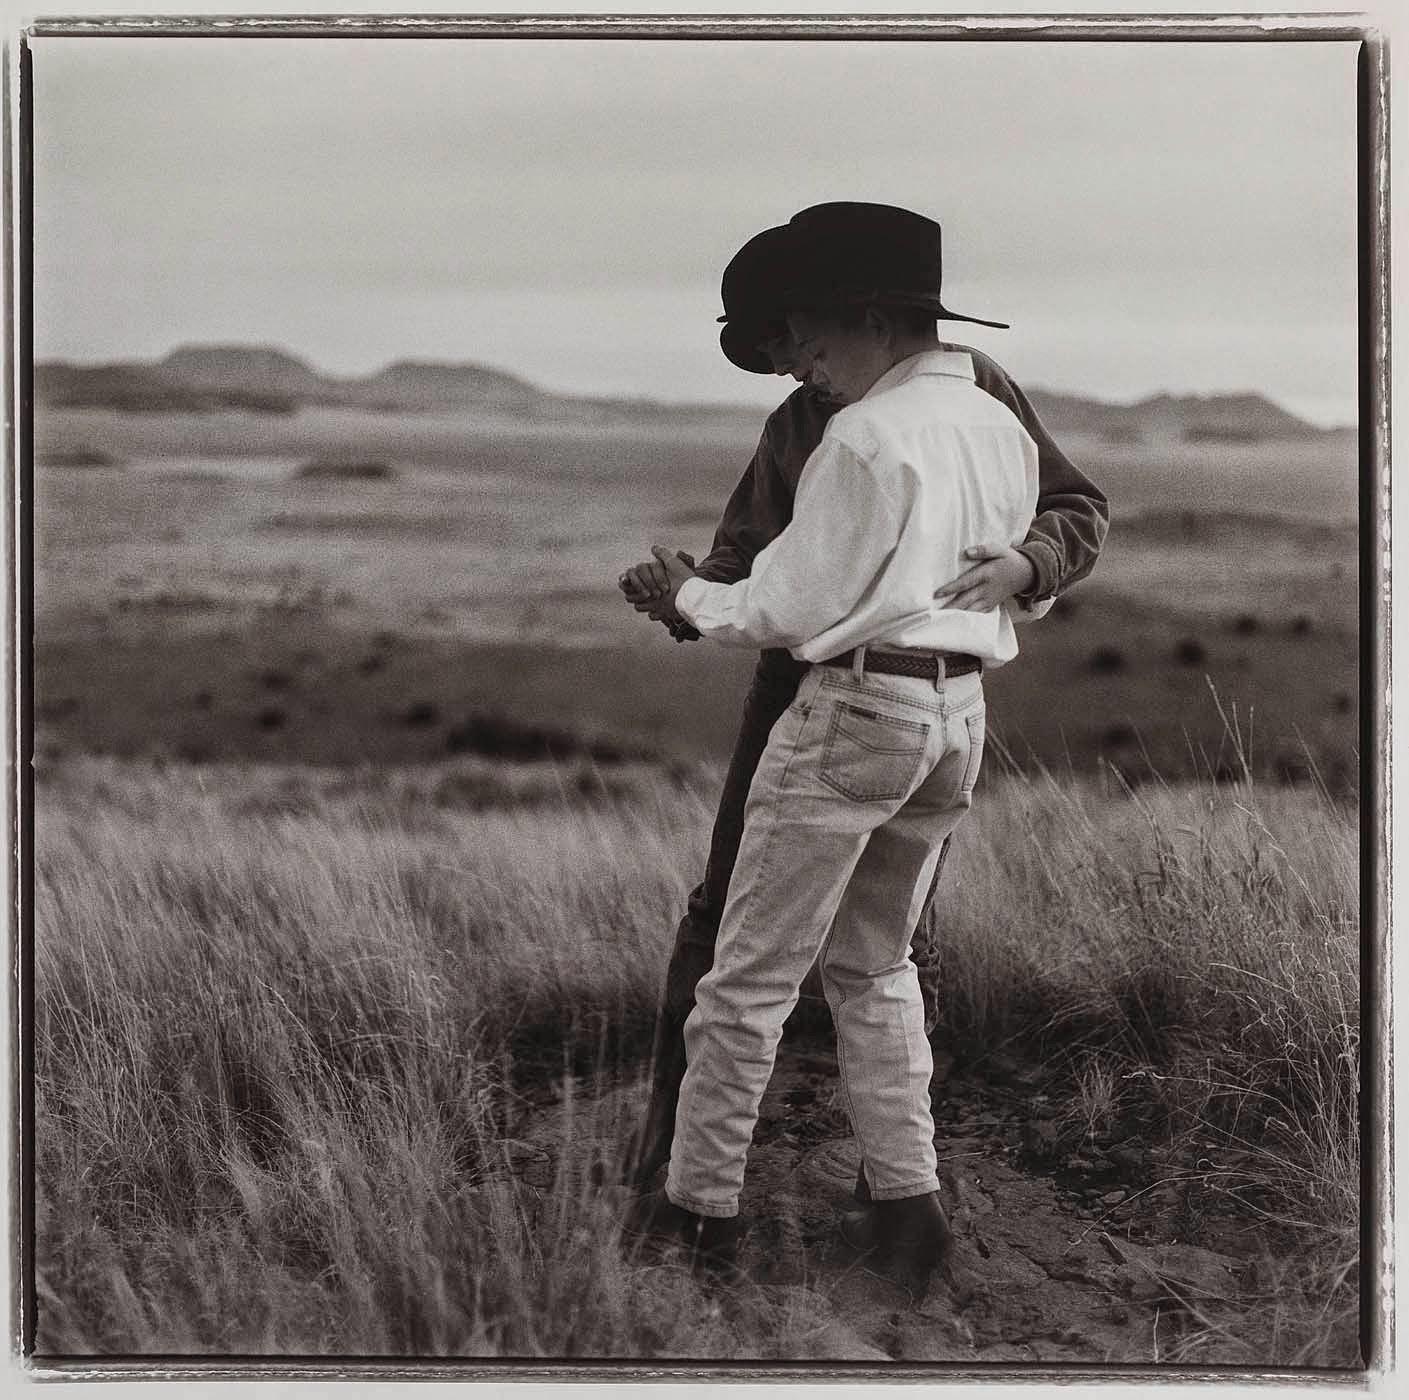 Keith Carter (b.1948) is an American (USA) photographer